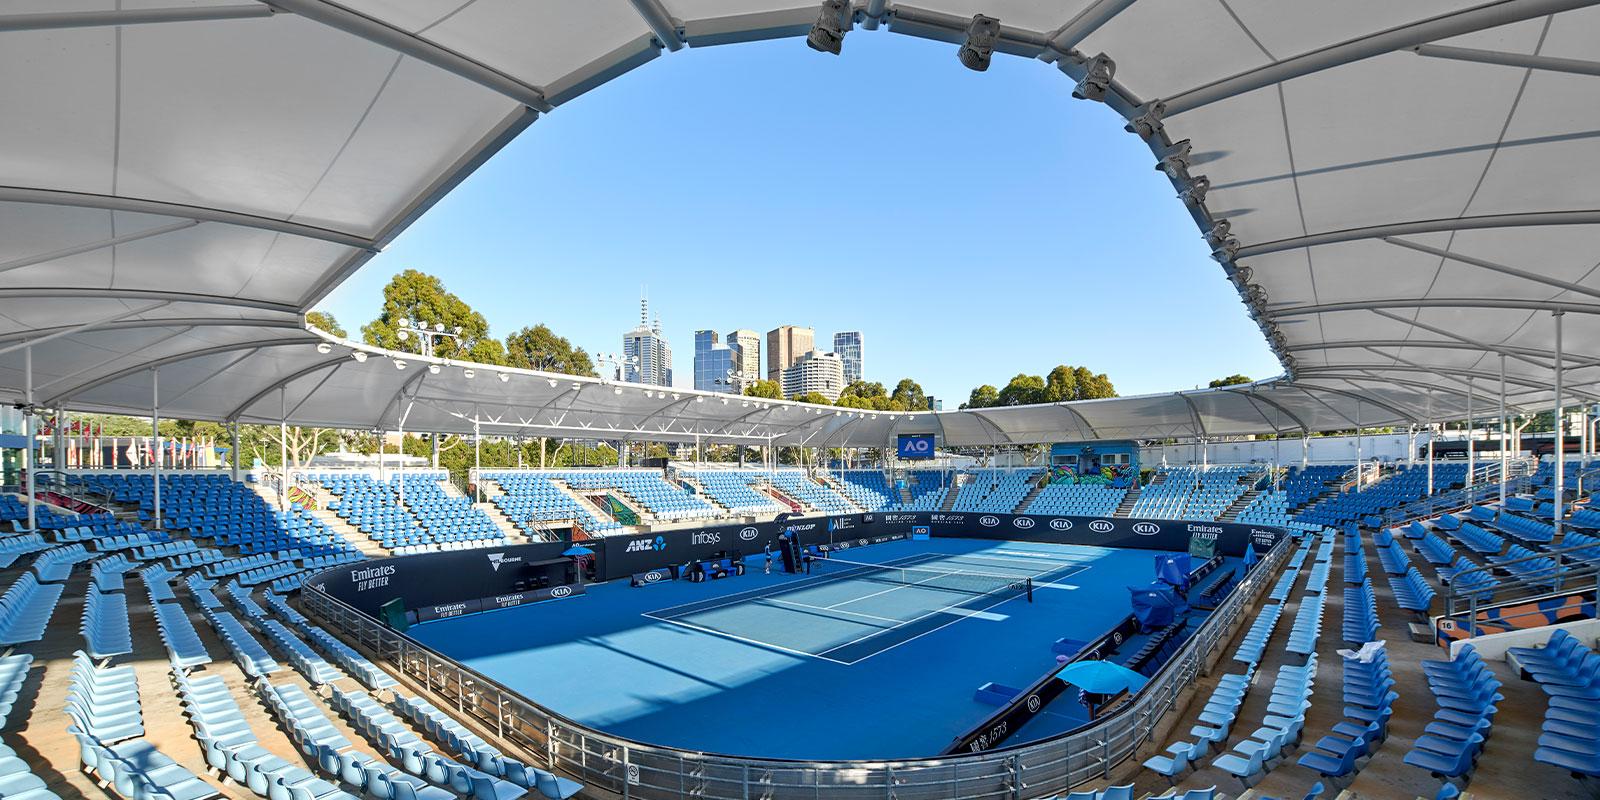 Australian Open Show court 3 Shade Canopy